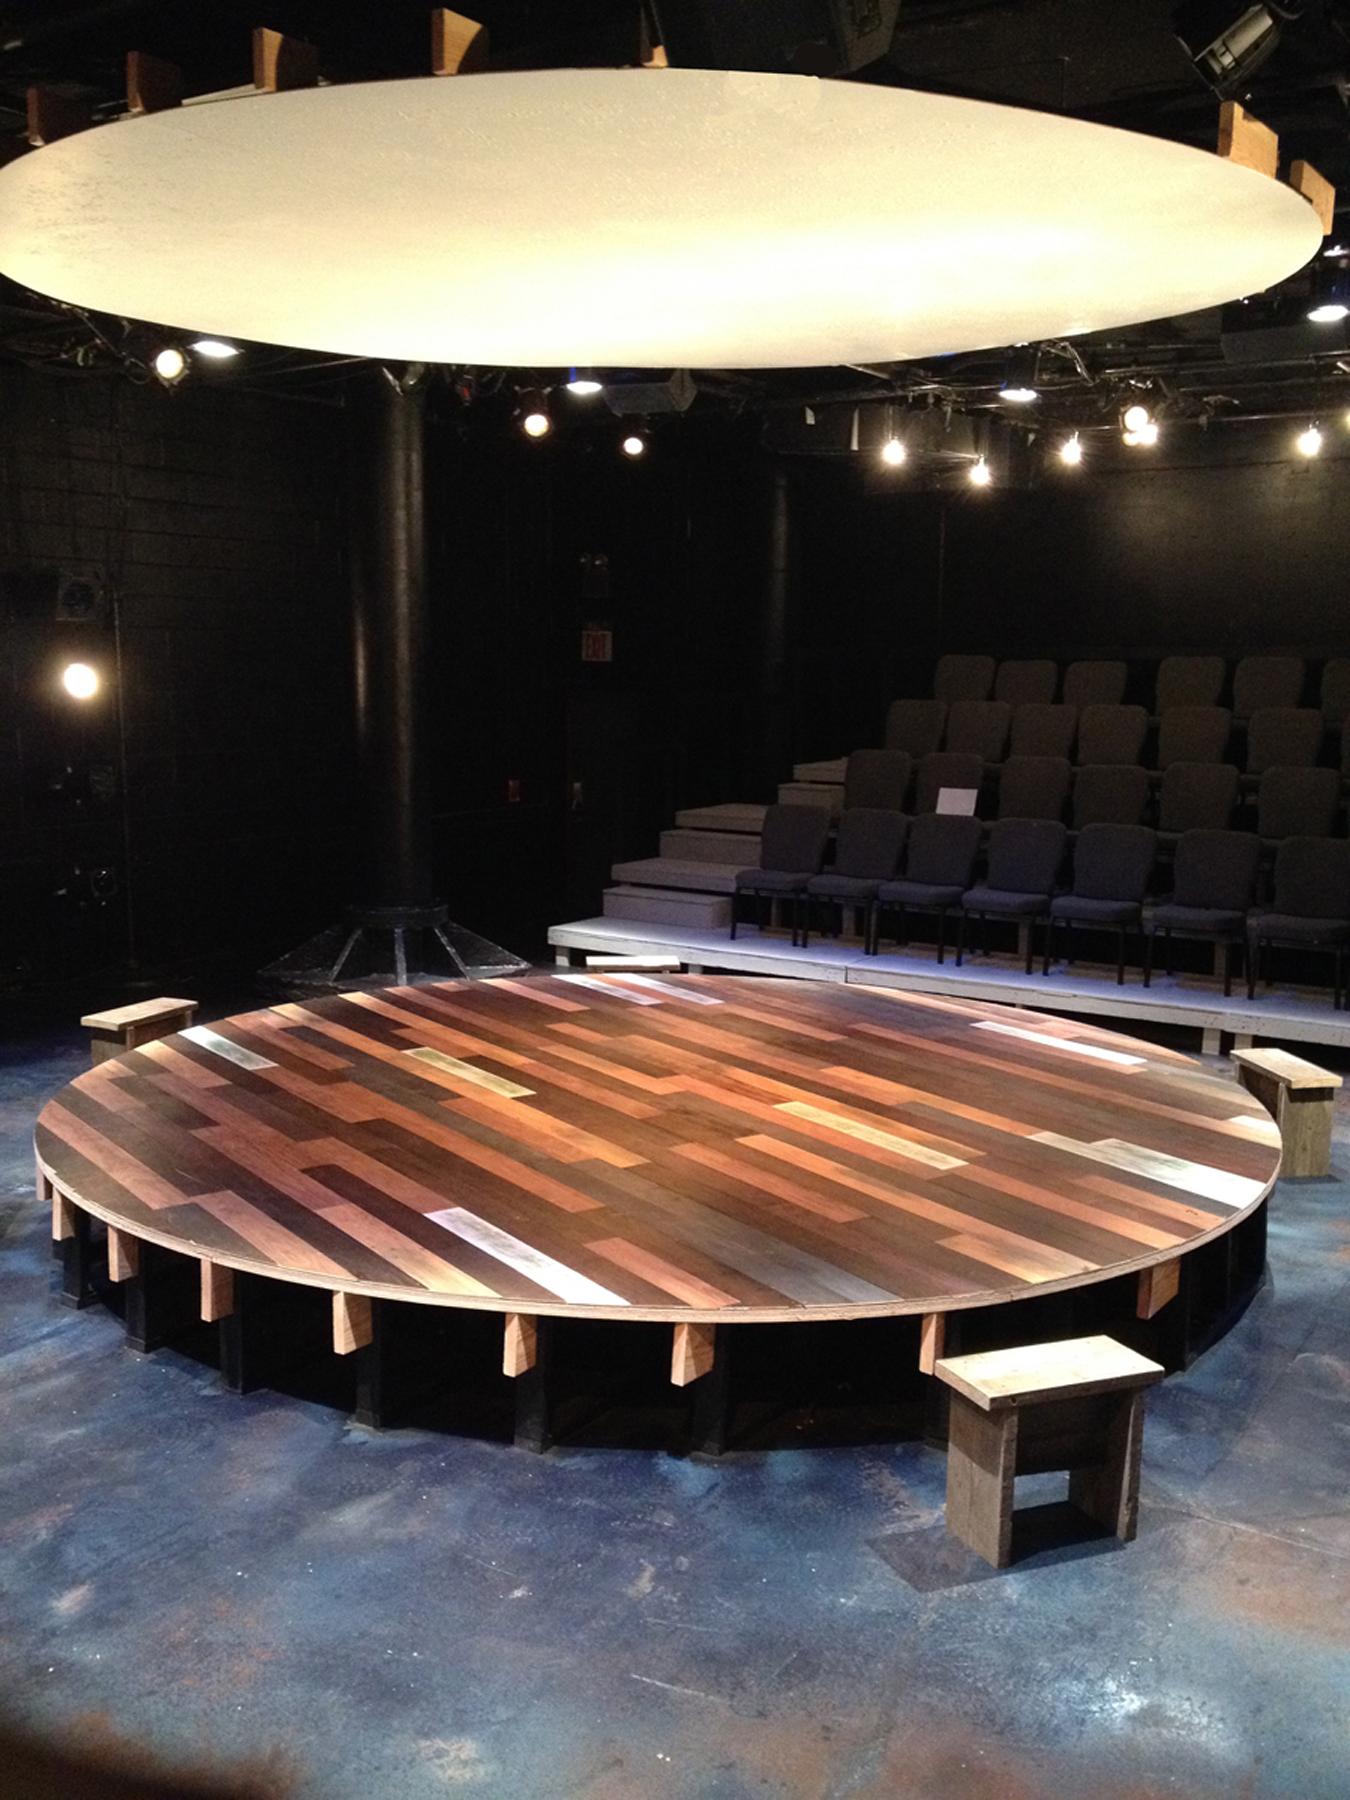 Family Play (1979 to Present) set, 2014, The New Ohio Theatre.